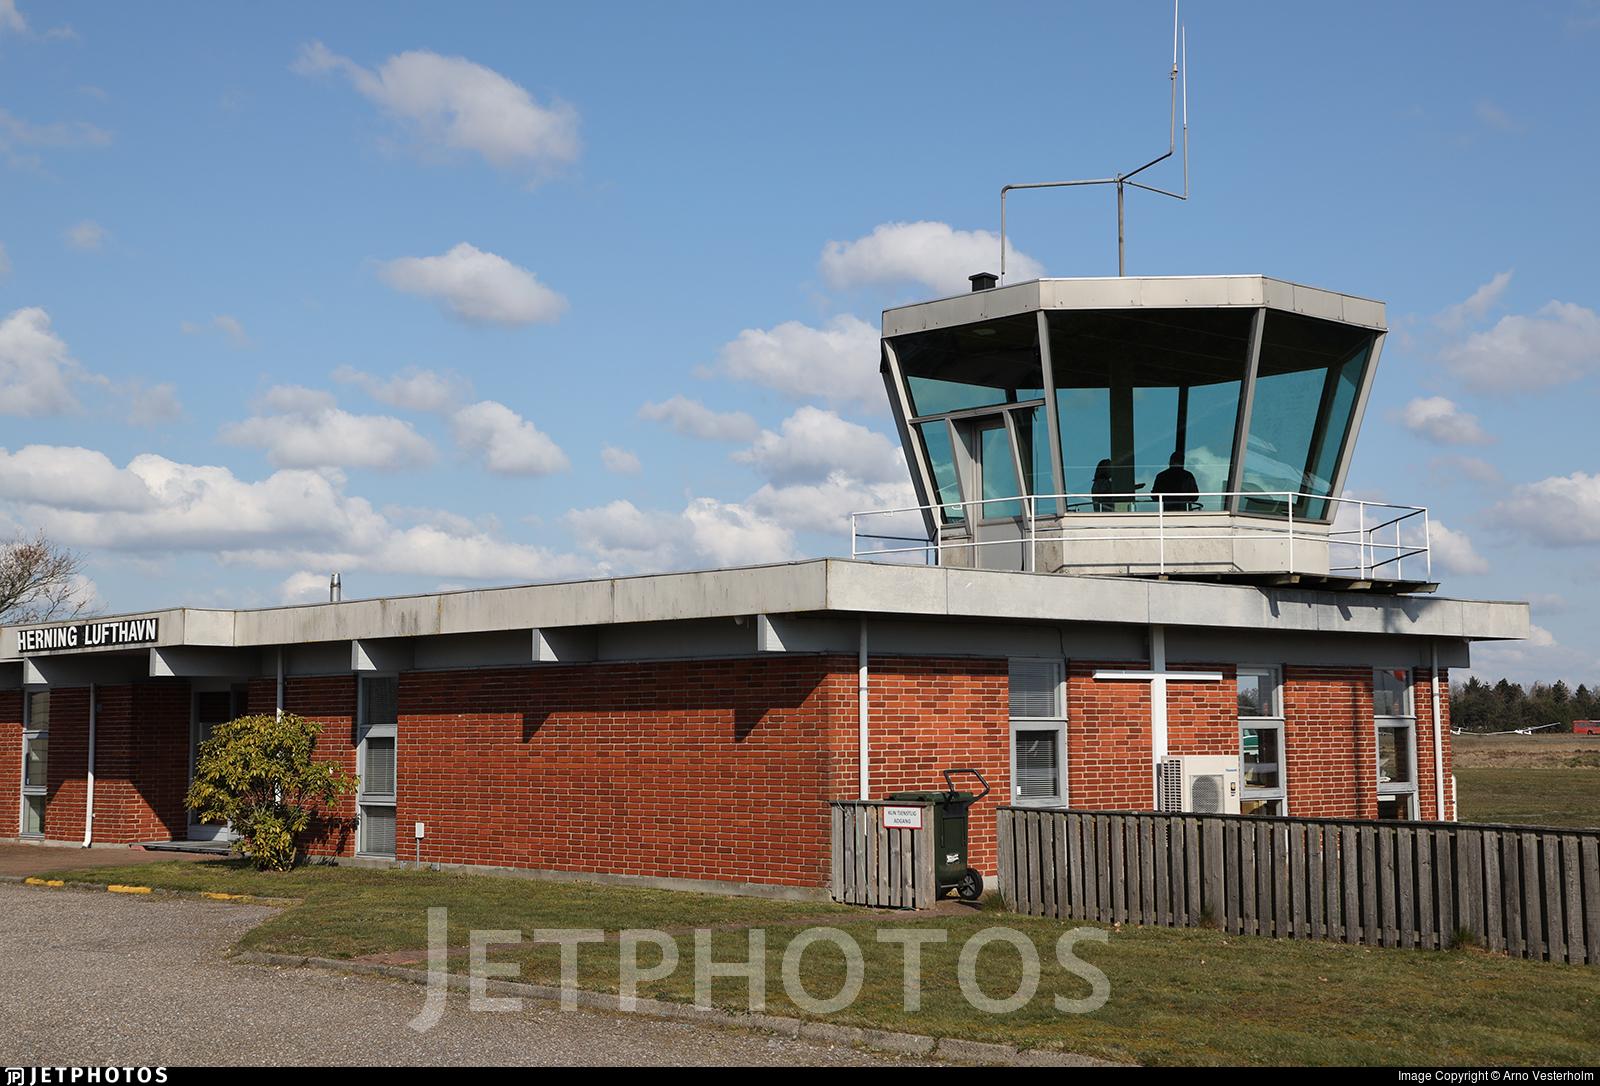 EKHG - Airport - Control Tower